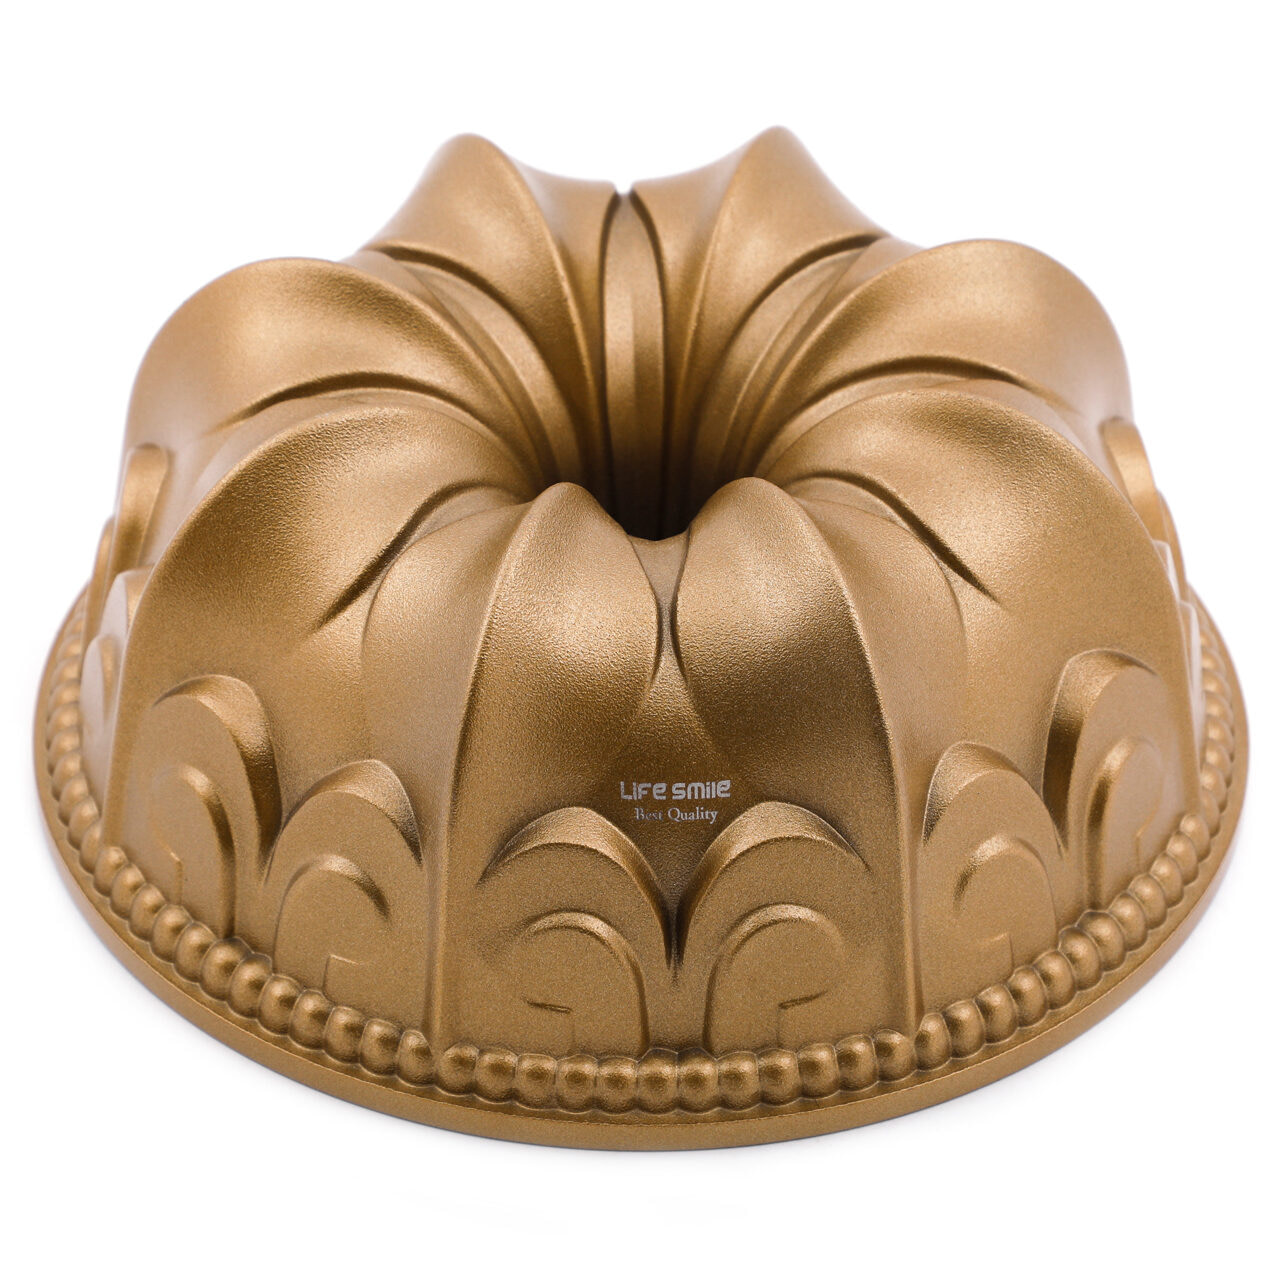 Life Smile Lily Flower Cake Pan